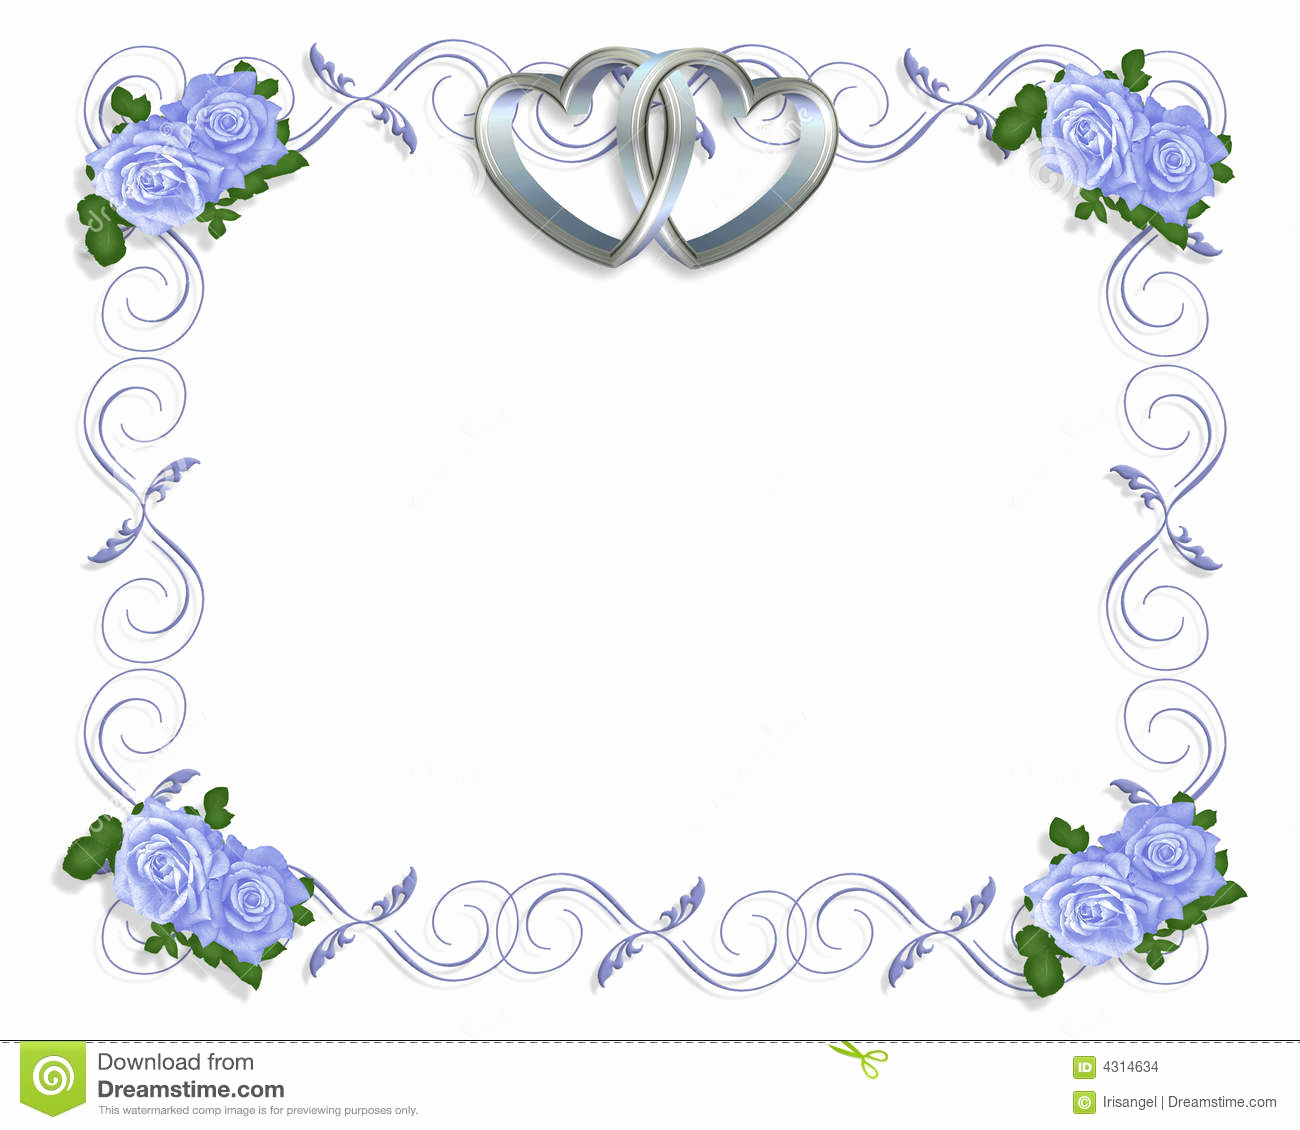 Wedding Invitation Borders Design Unique Wedding Invitation Border Blue Roses Stock Illustration